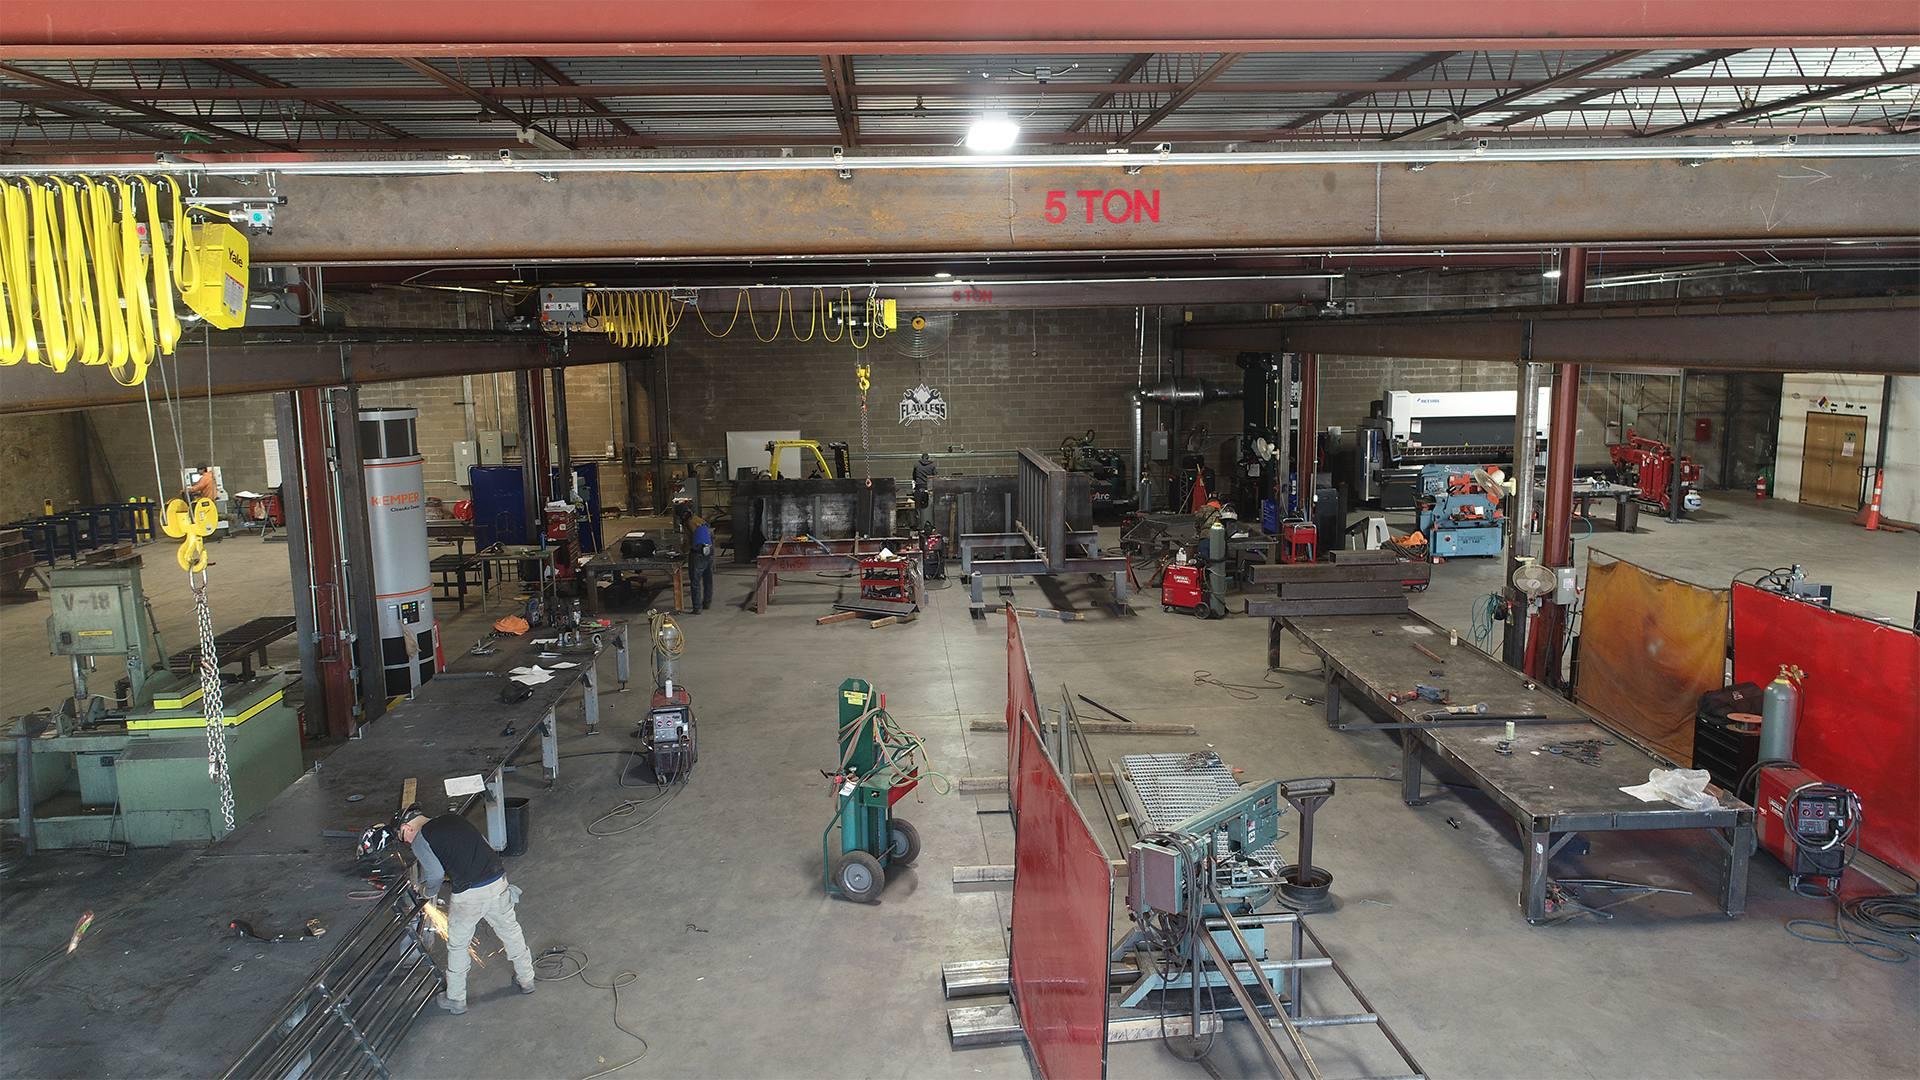 Flawless Steel Welding Base of Operations